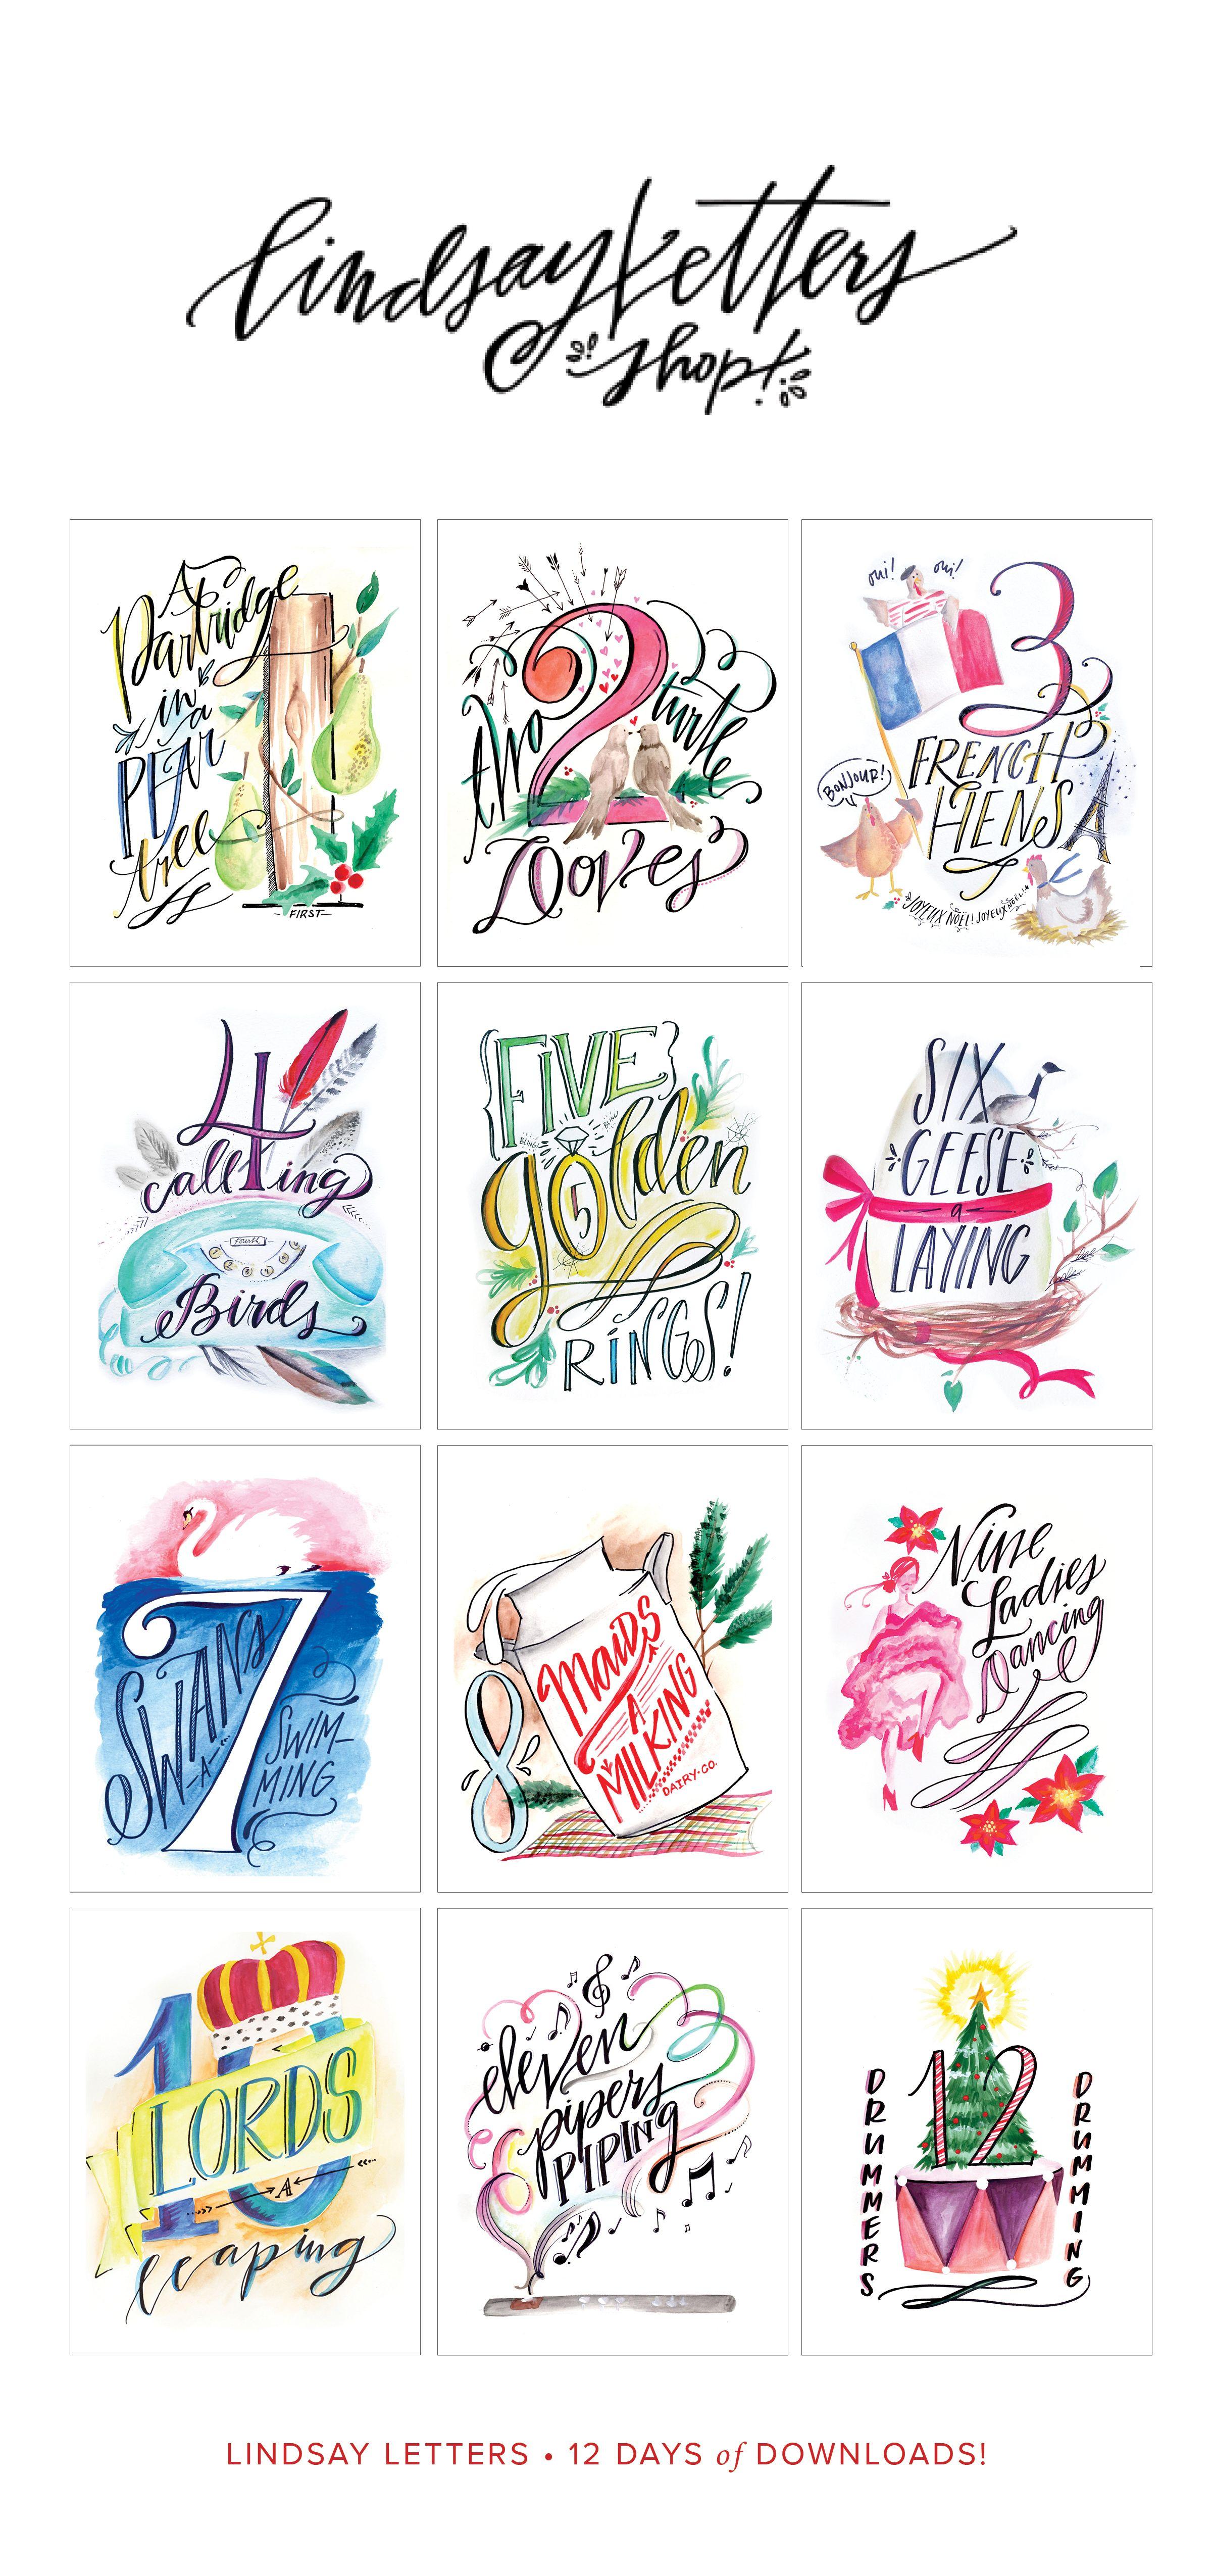 Lindsay Letters 12 Days Of Christmas Printables